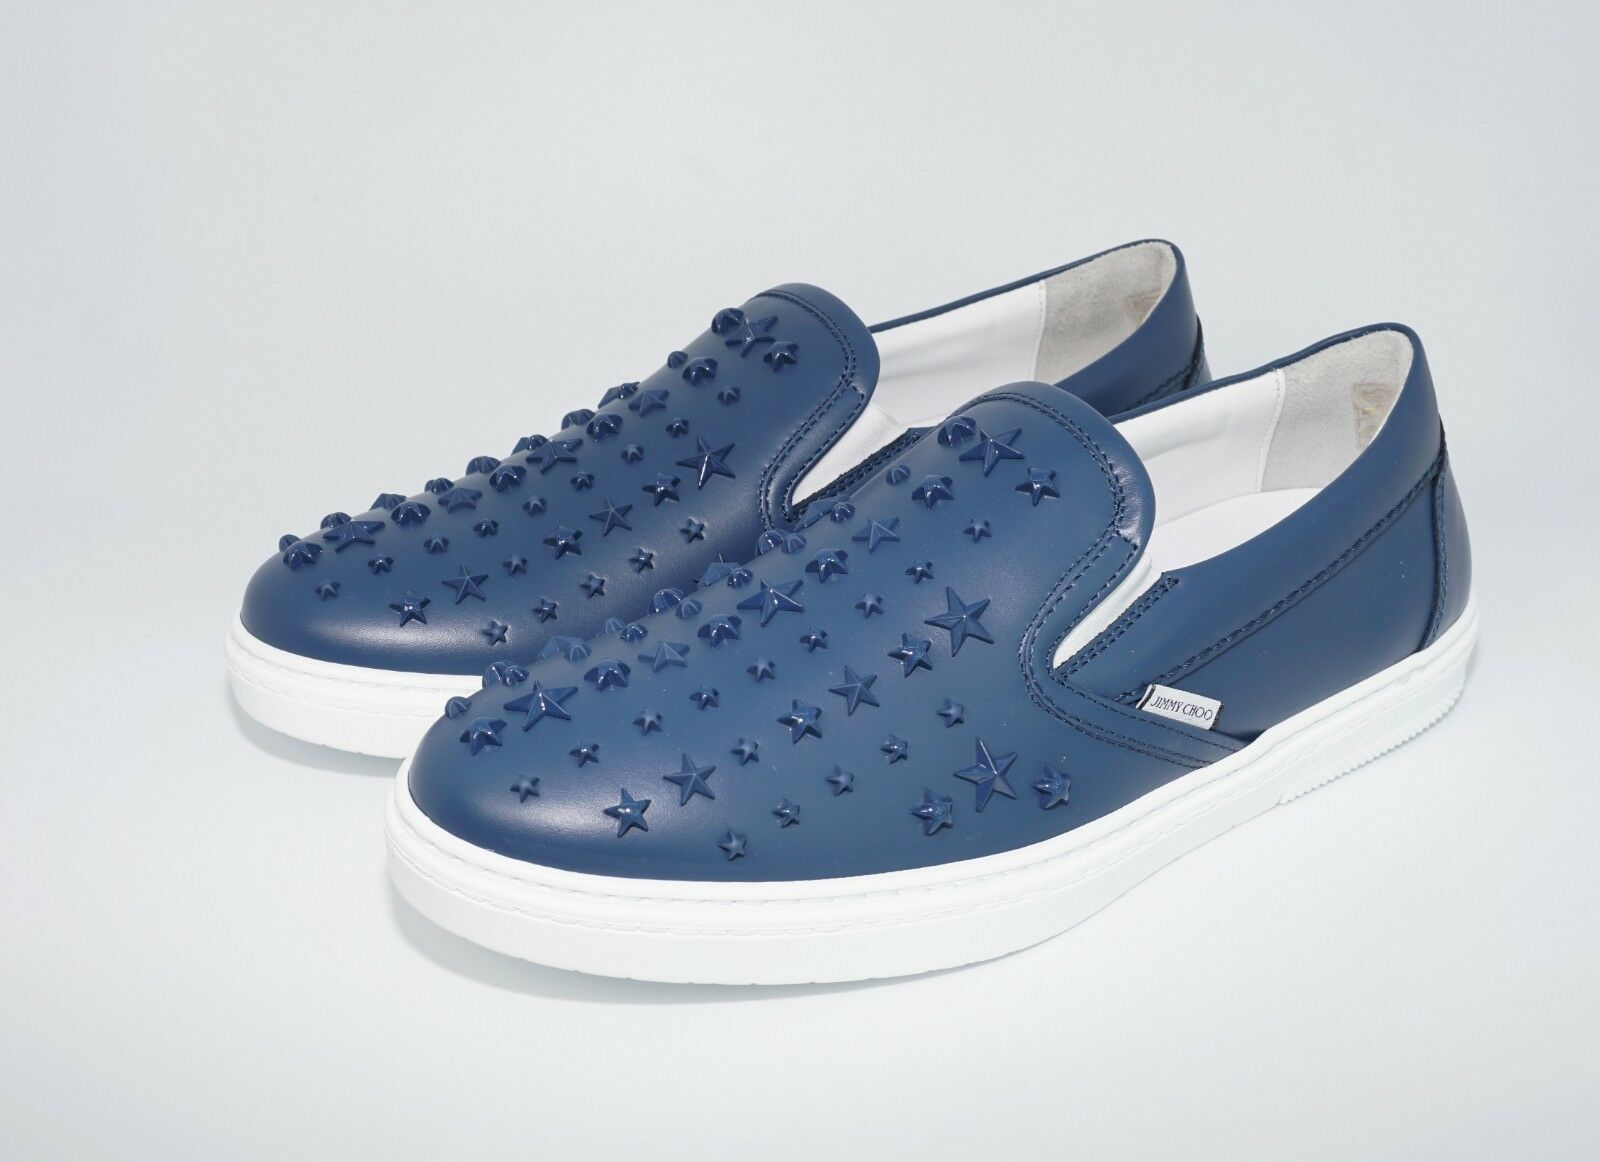 Jimmy Choo Men's Grove Star Embellished Sport Leather Slip-On scarpe da ginnastica, MSRP  795